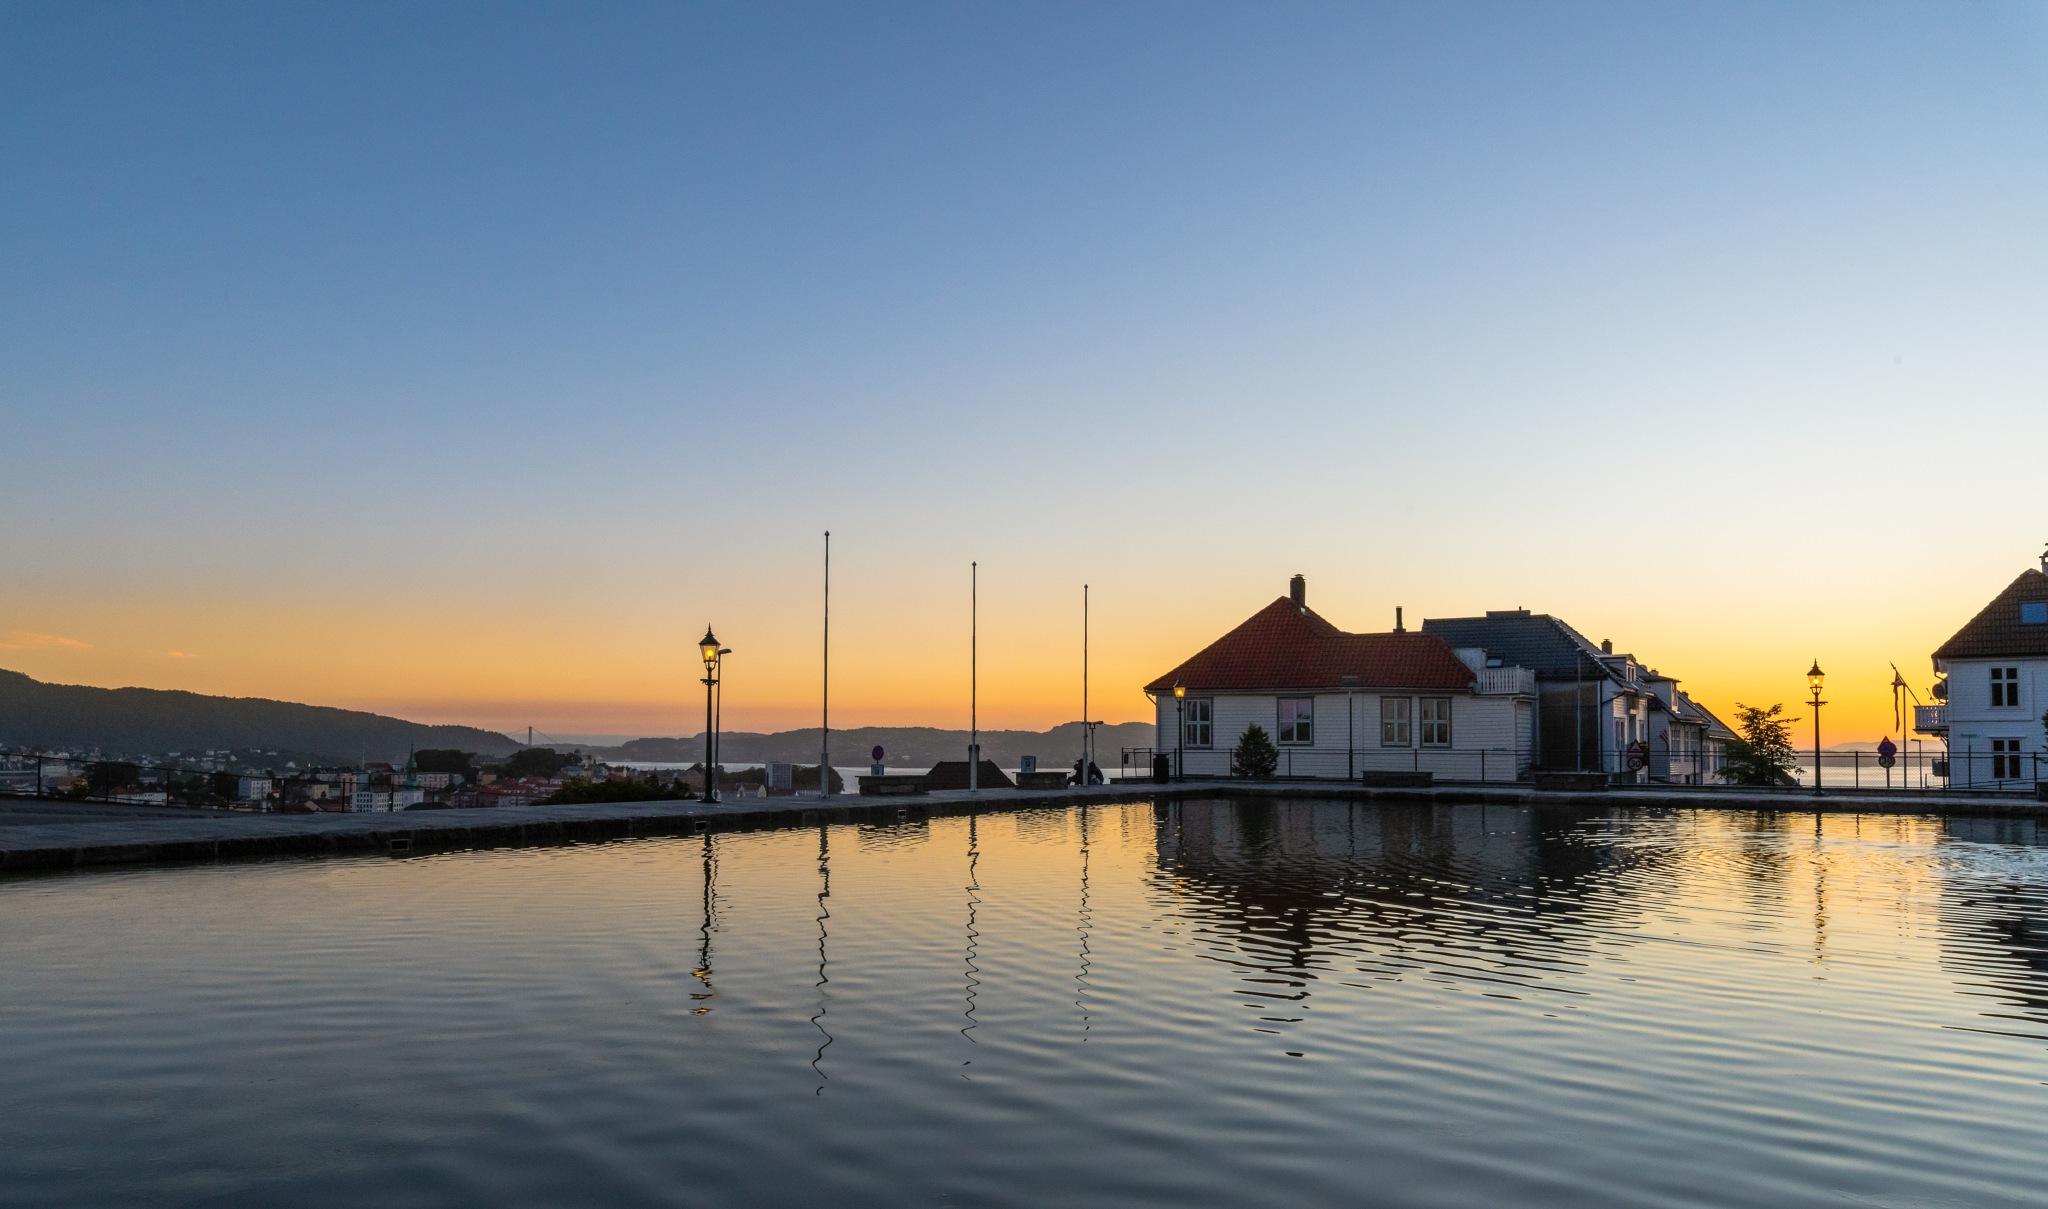 After sunset by Svein-Rene Kraakenes